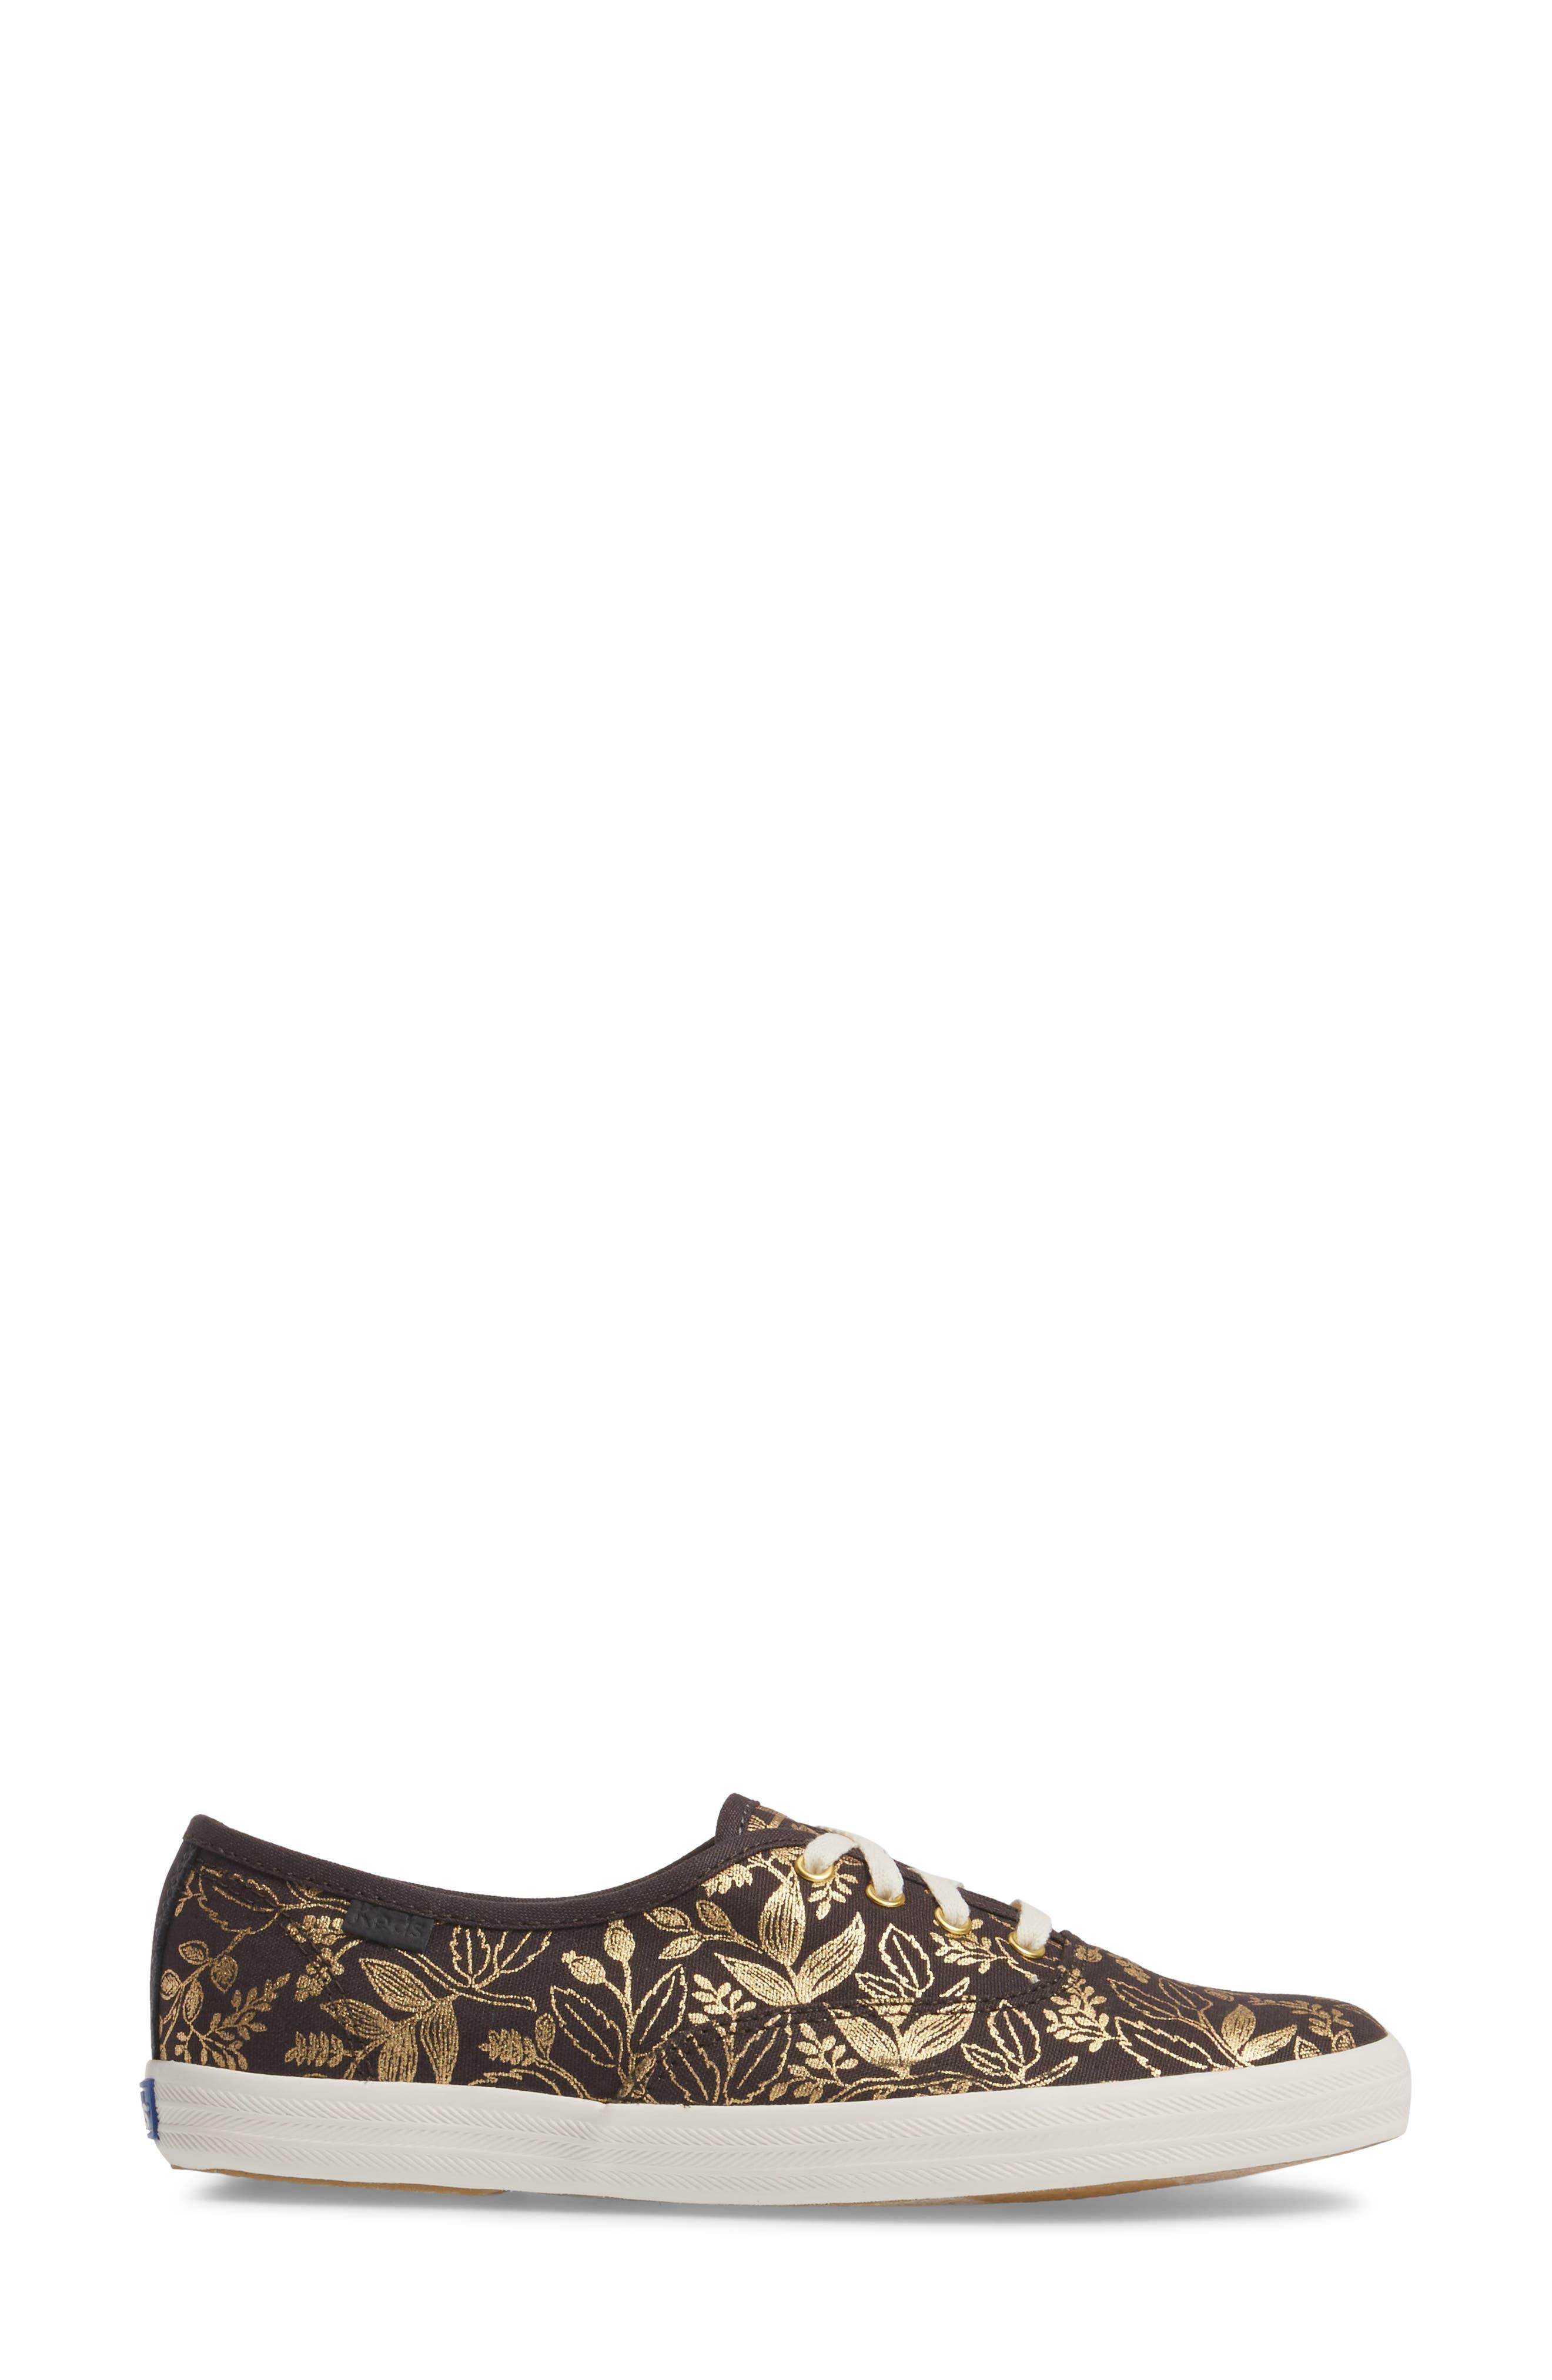 Alternate Image 3  - Keds® x Rifle Paper Co. Queen Anne Sneaker (Women)